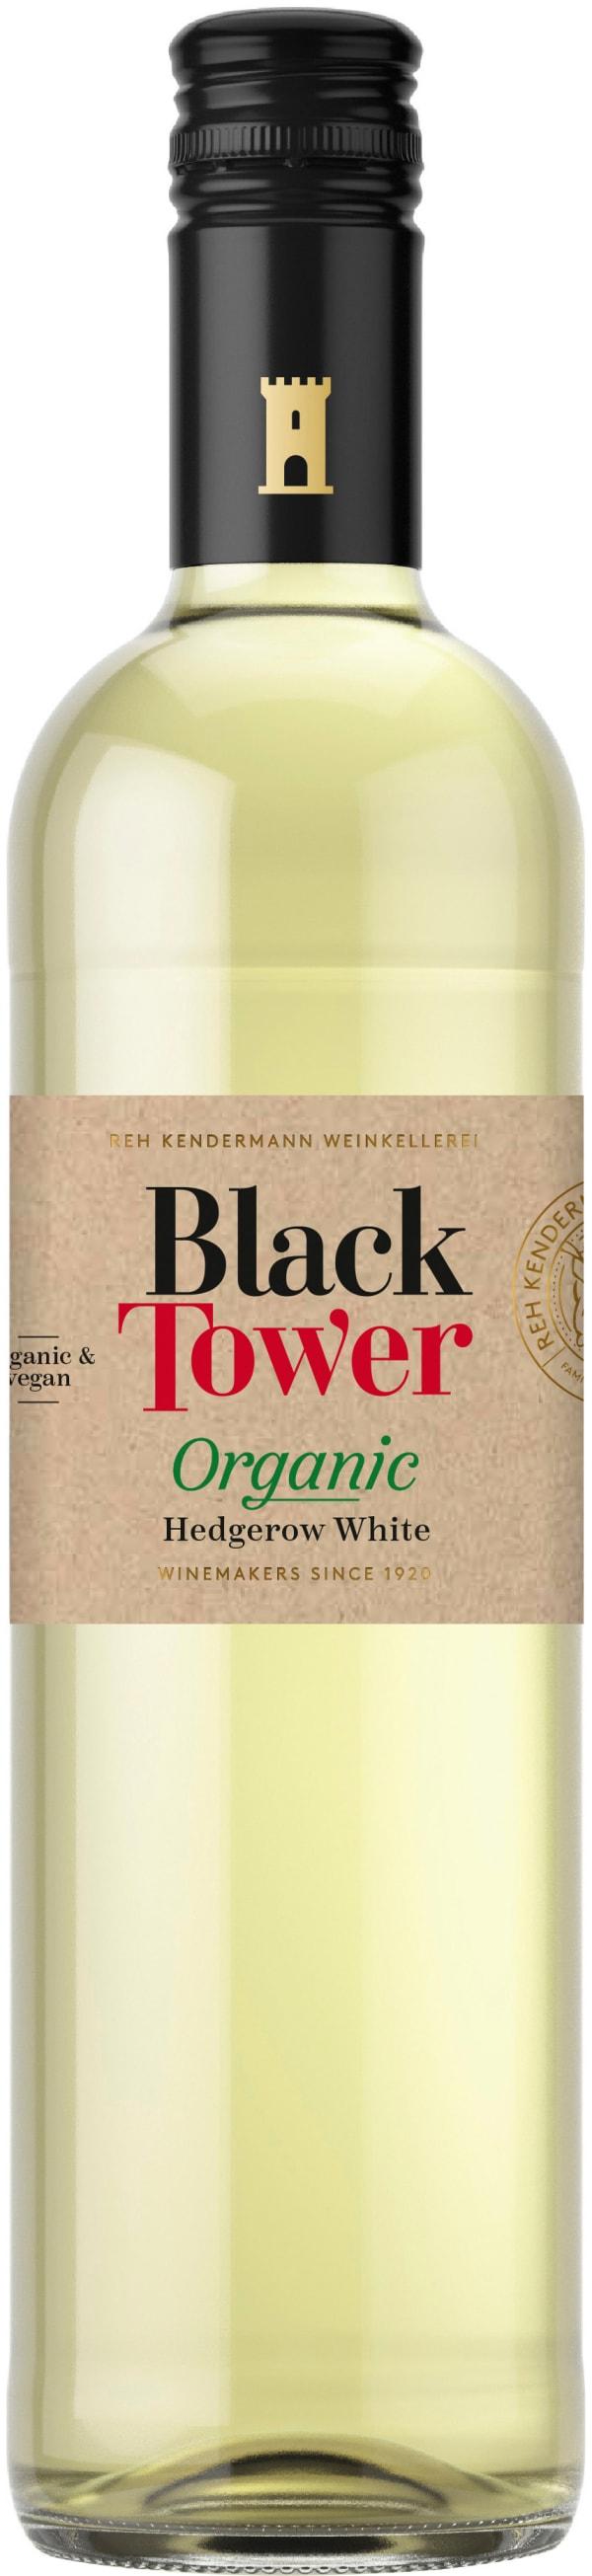 Black Tower Hedgerow Organic 2020